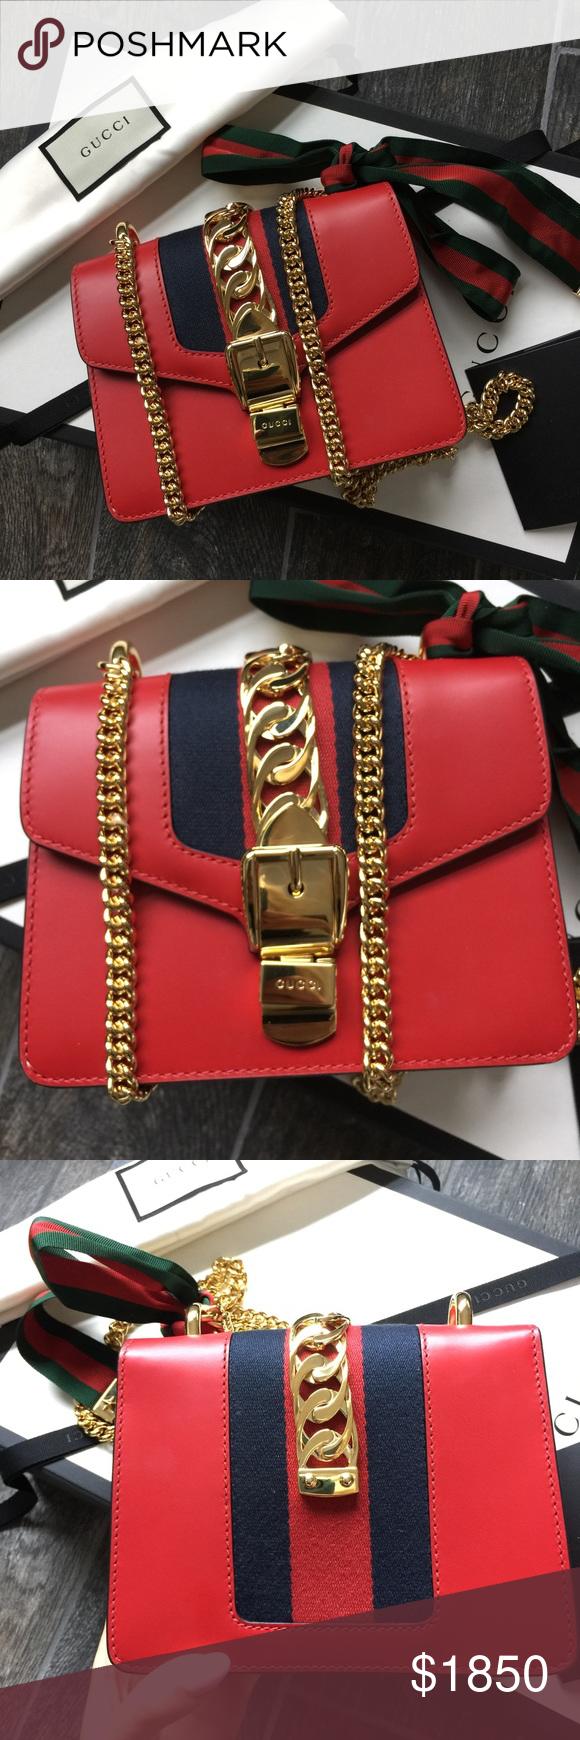 809843689321 Gucci Sylvie Leather Mini Chain Bag Authentic Gucci Sylvie Leather Mini  Chain Bag in hibiscus red